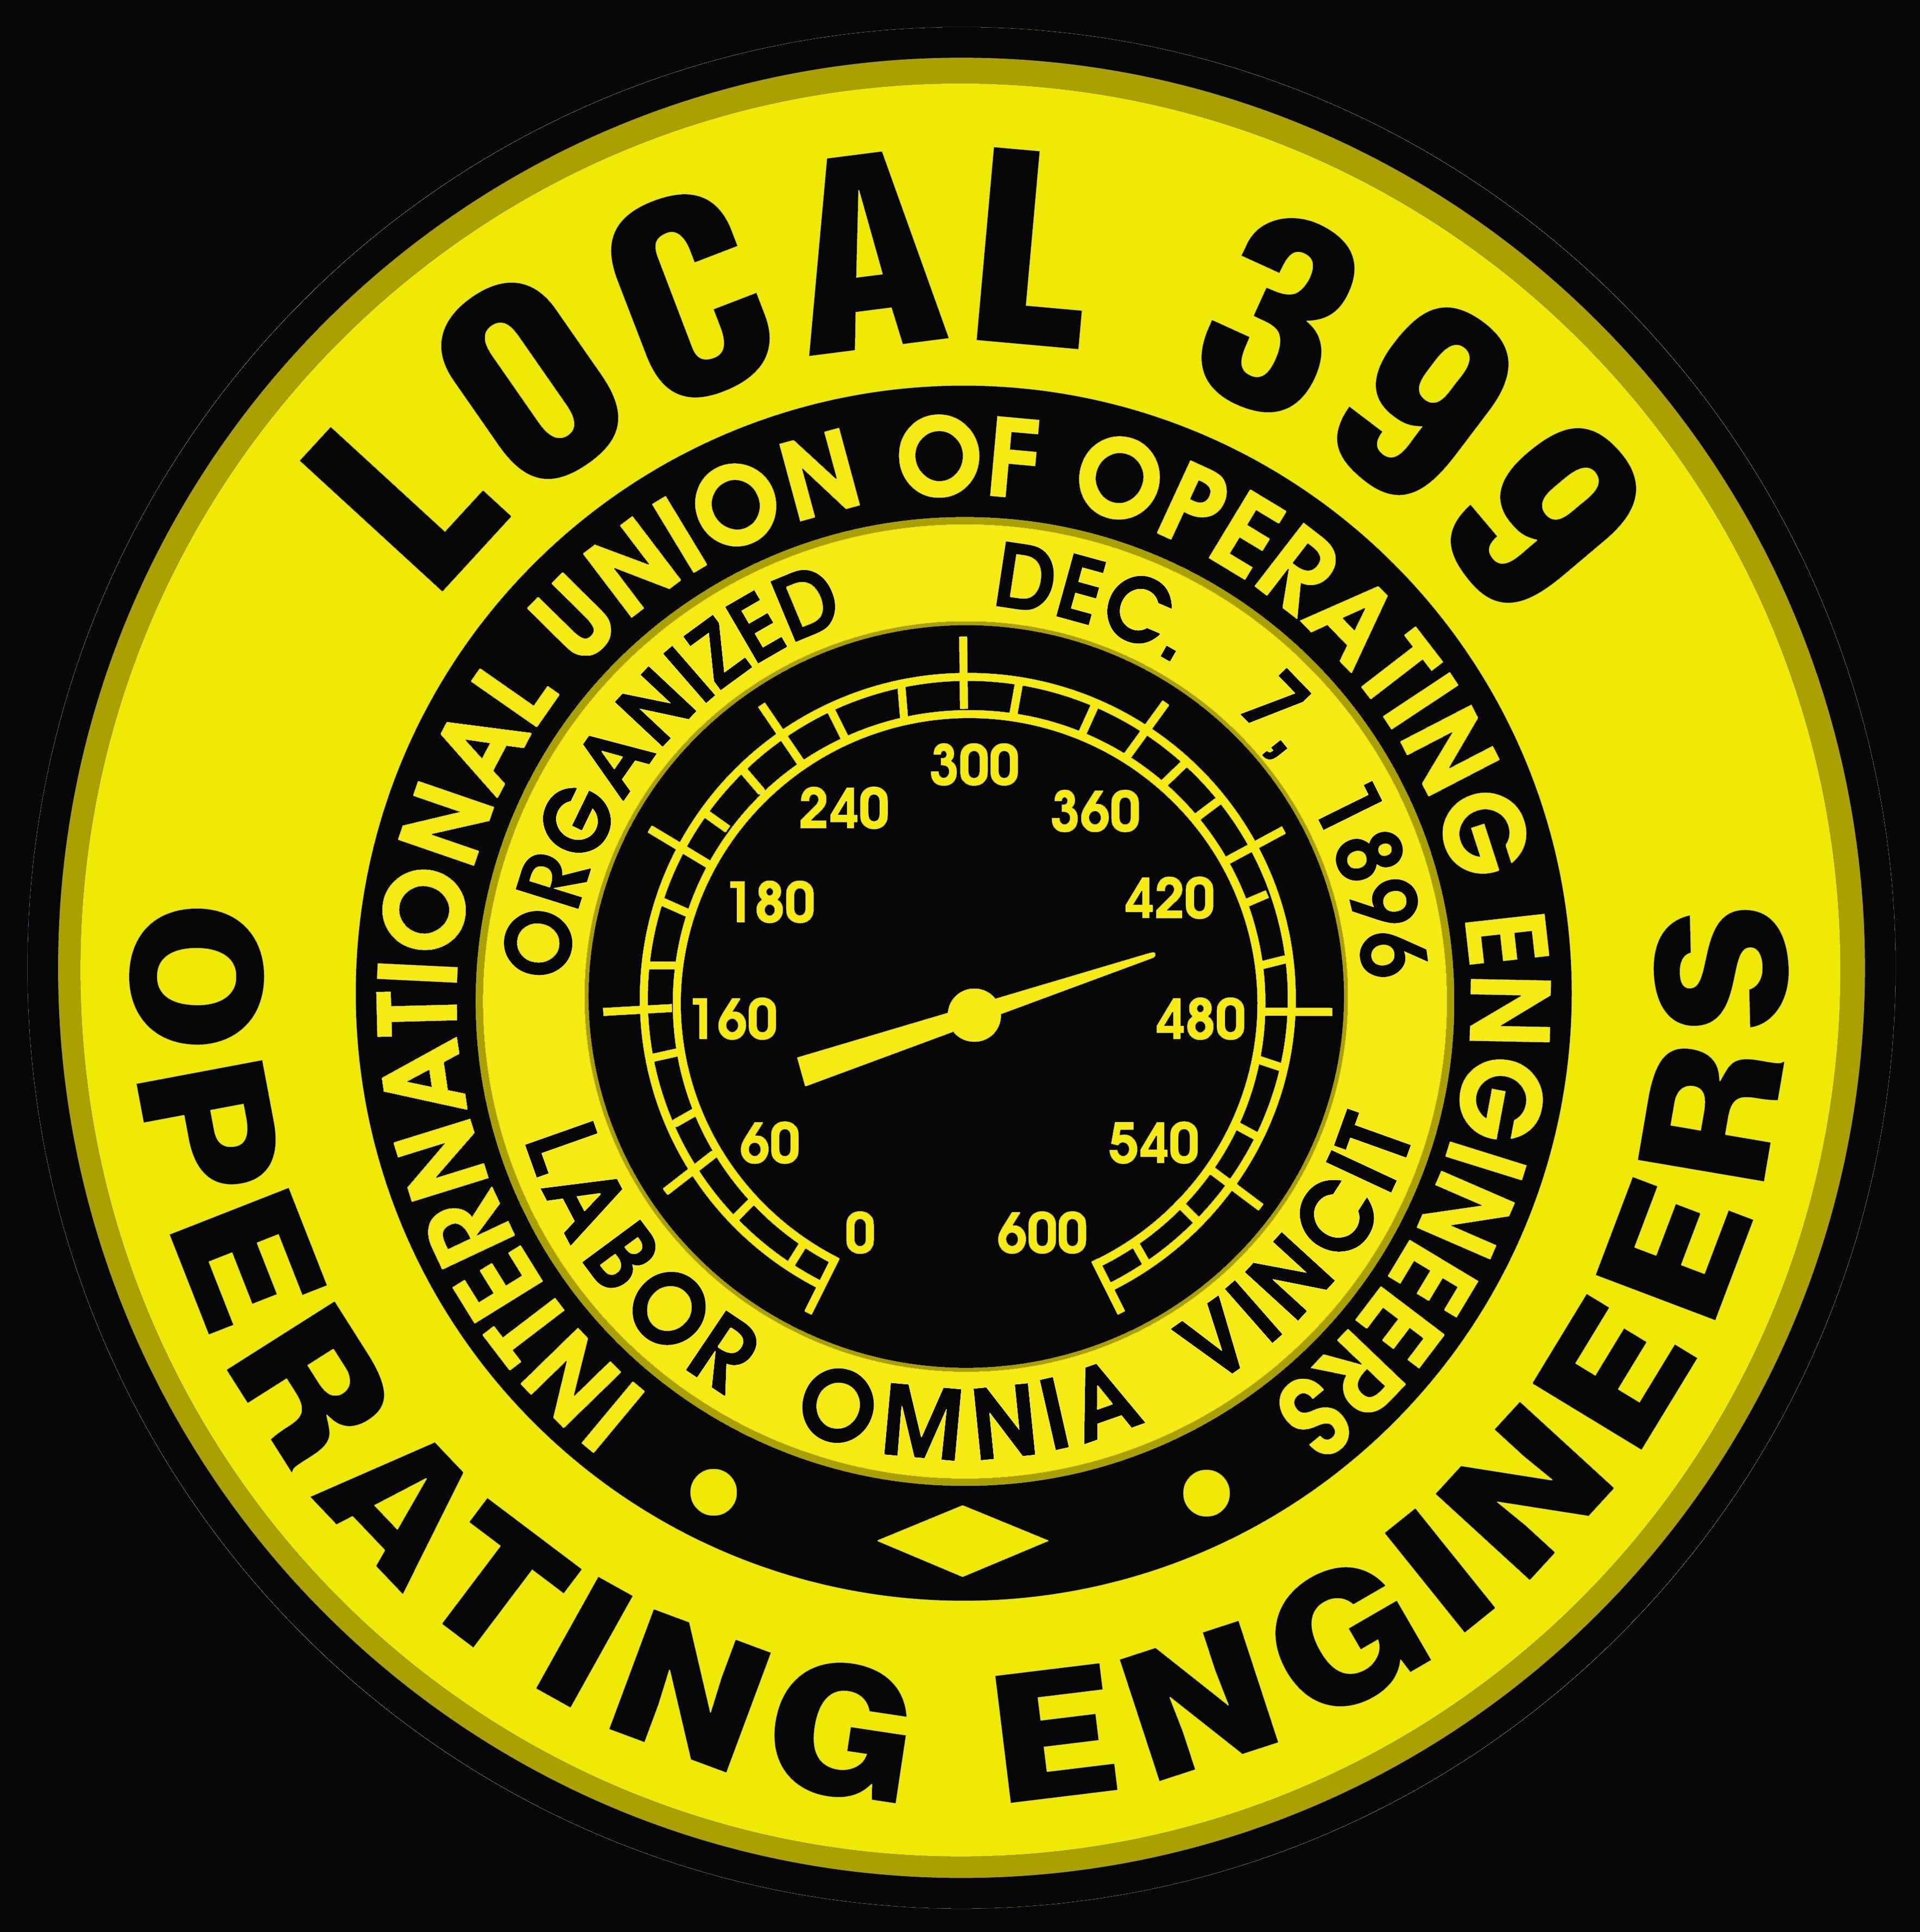 International Union Of Operating Engineers Local 399 Operating